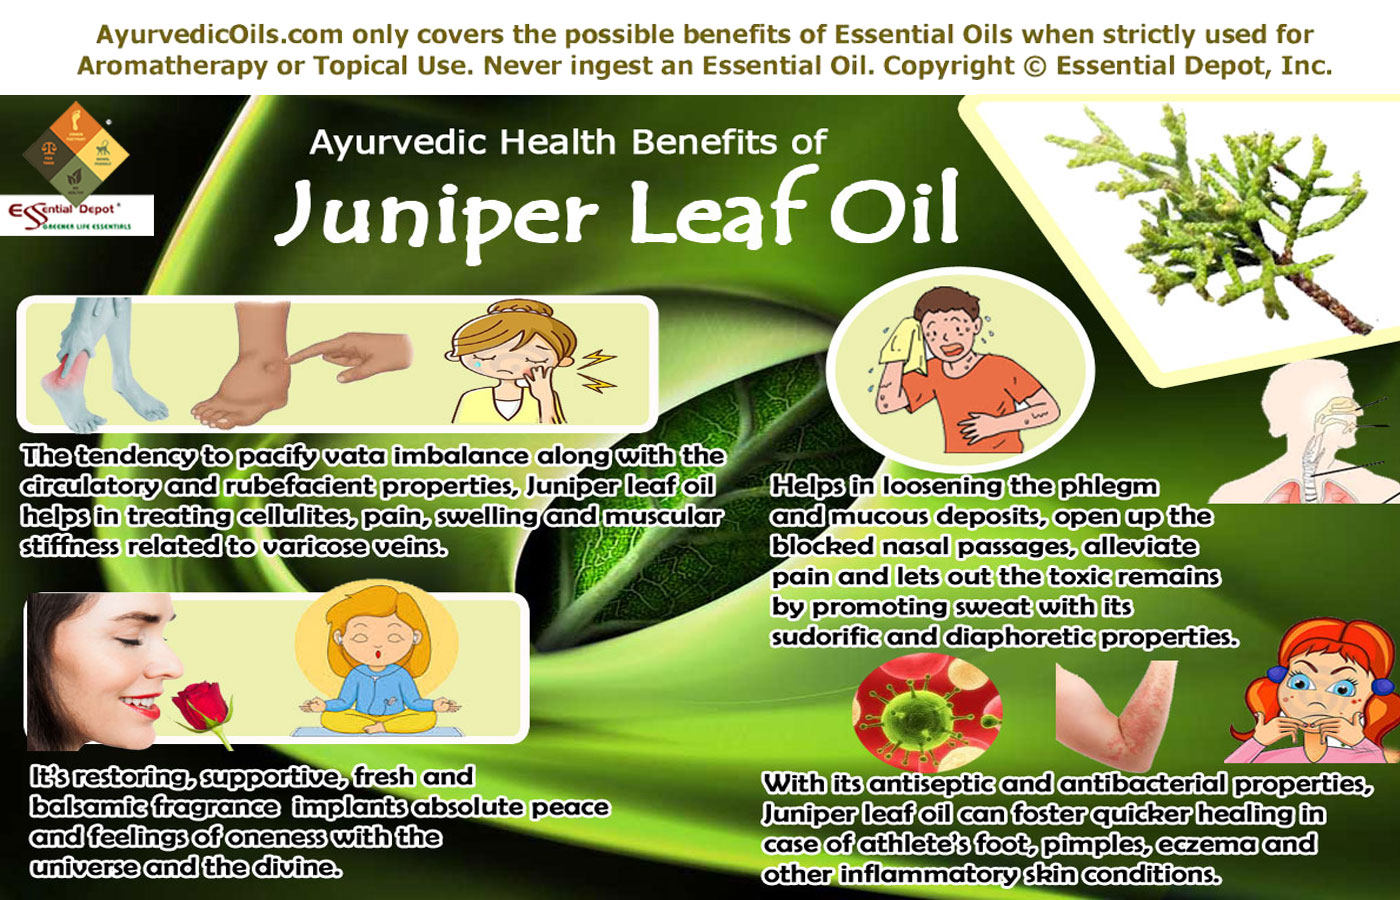 Ayurvedic oils for renal calculi | Essential Oil